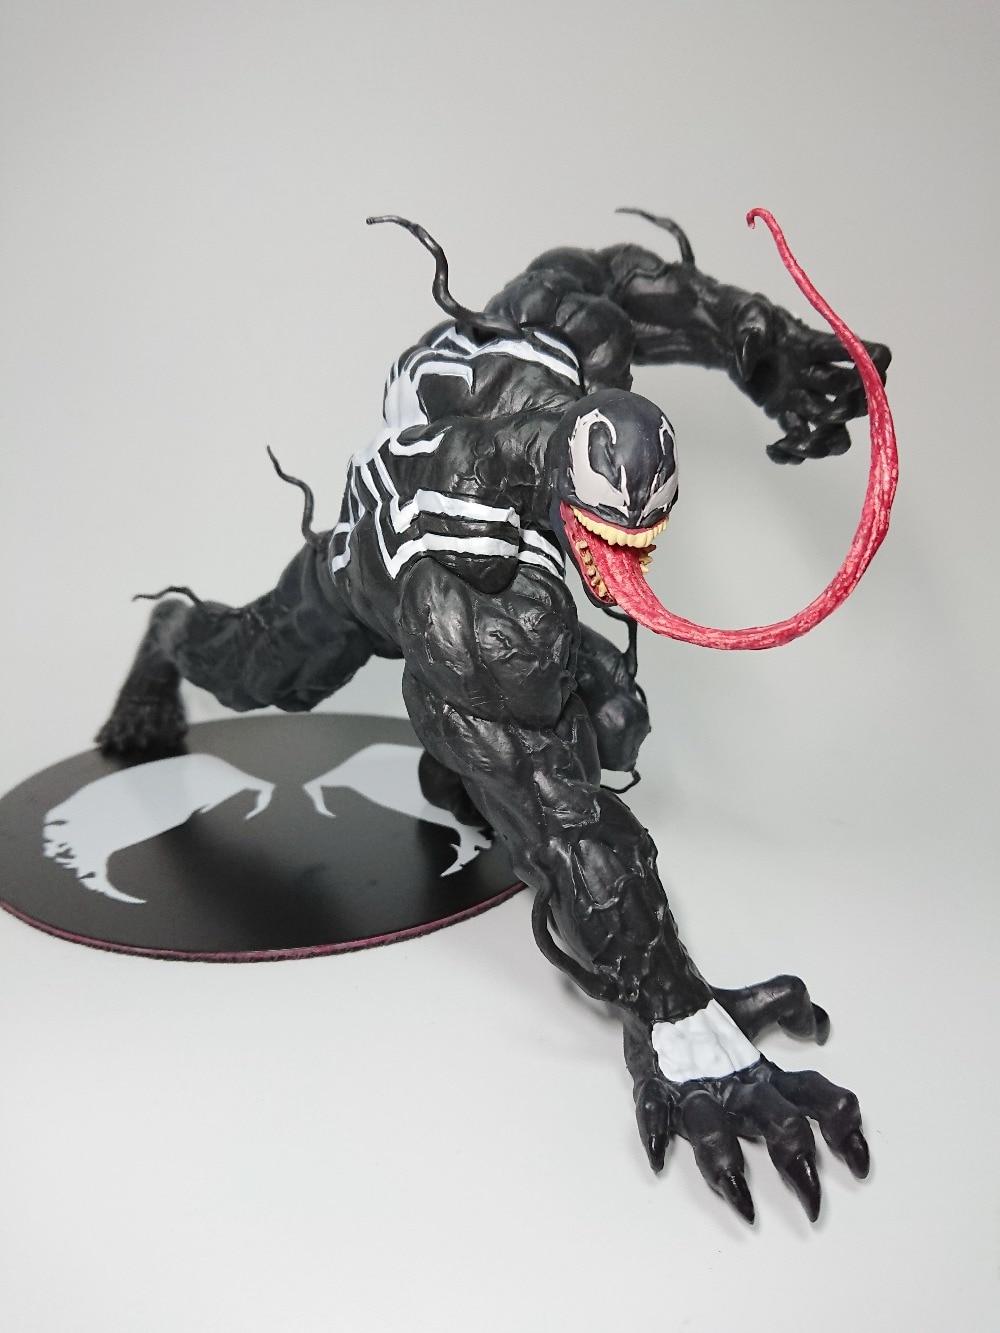 Spider Man Venom Figure ARTFX+ X MEN X-MEN Edward Brock Iron Man Wolverine PVC Action Figure Model Collection Toy Gift neca marvel legends venom pvc action figure collectible model toy 7 18cm kt3137